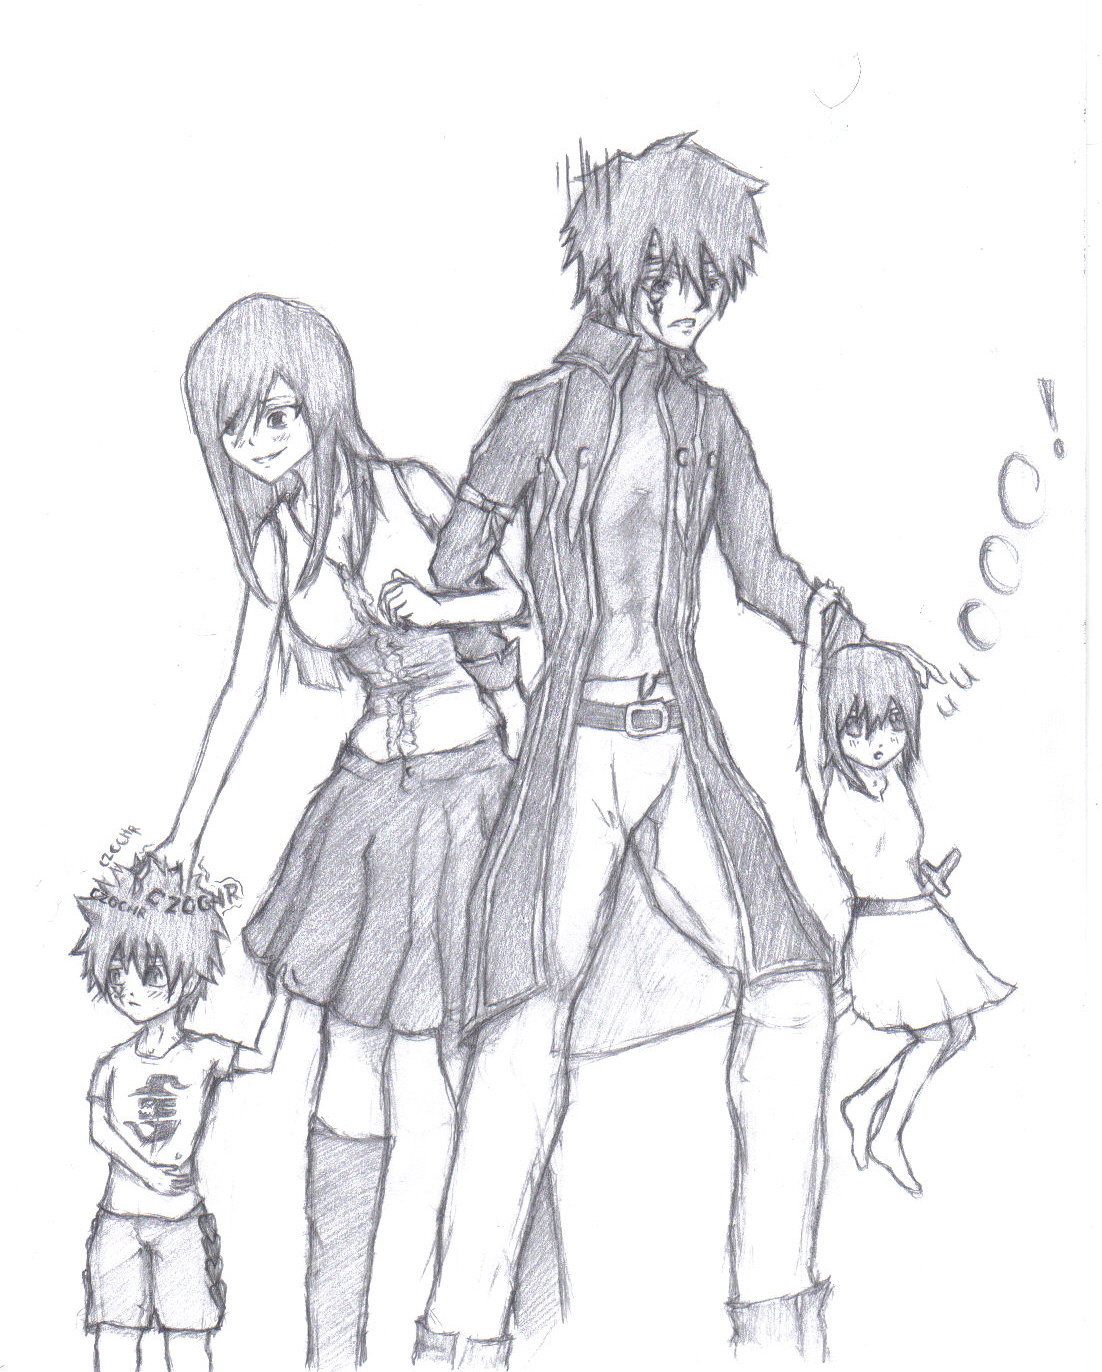 Erza X Jellal By TsugumiKenshi On DeviantArt